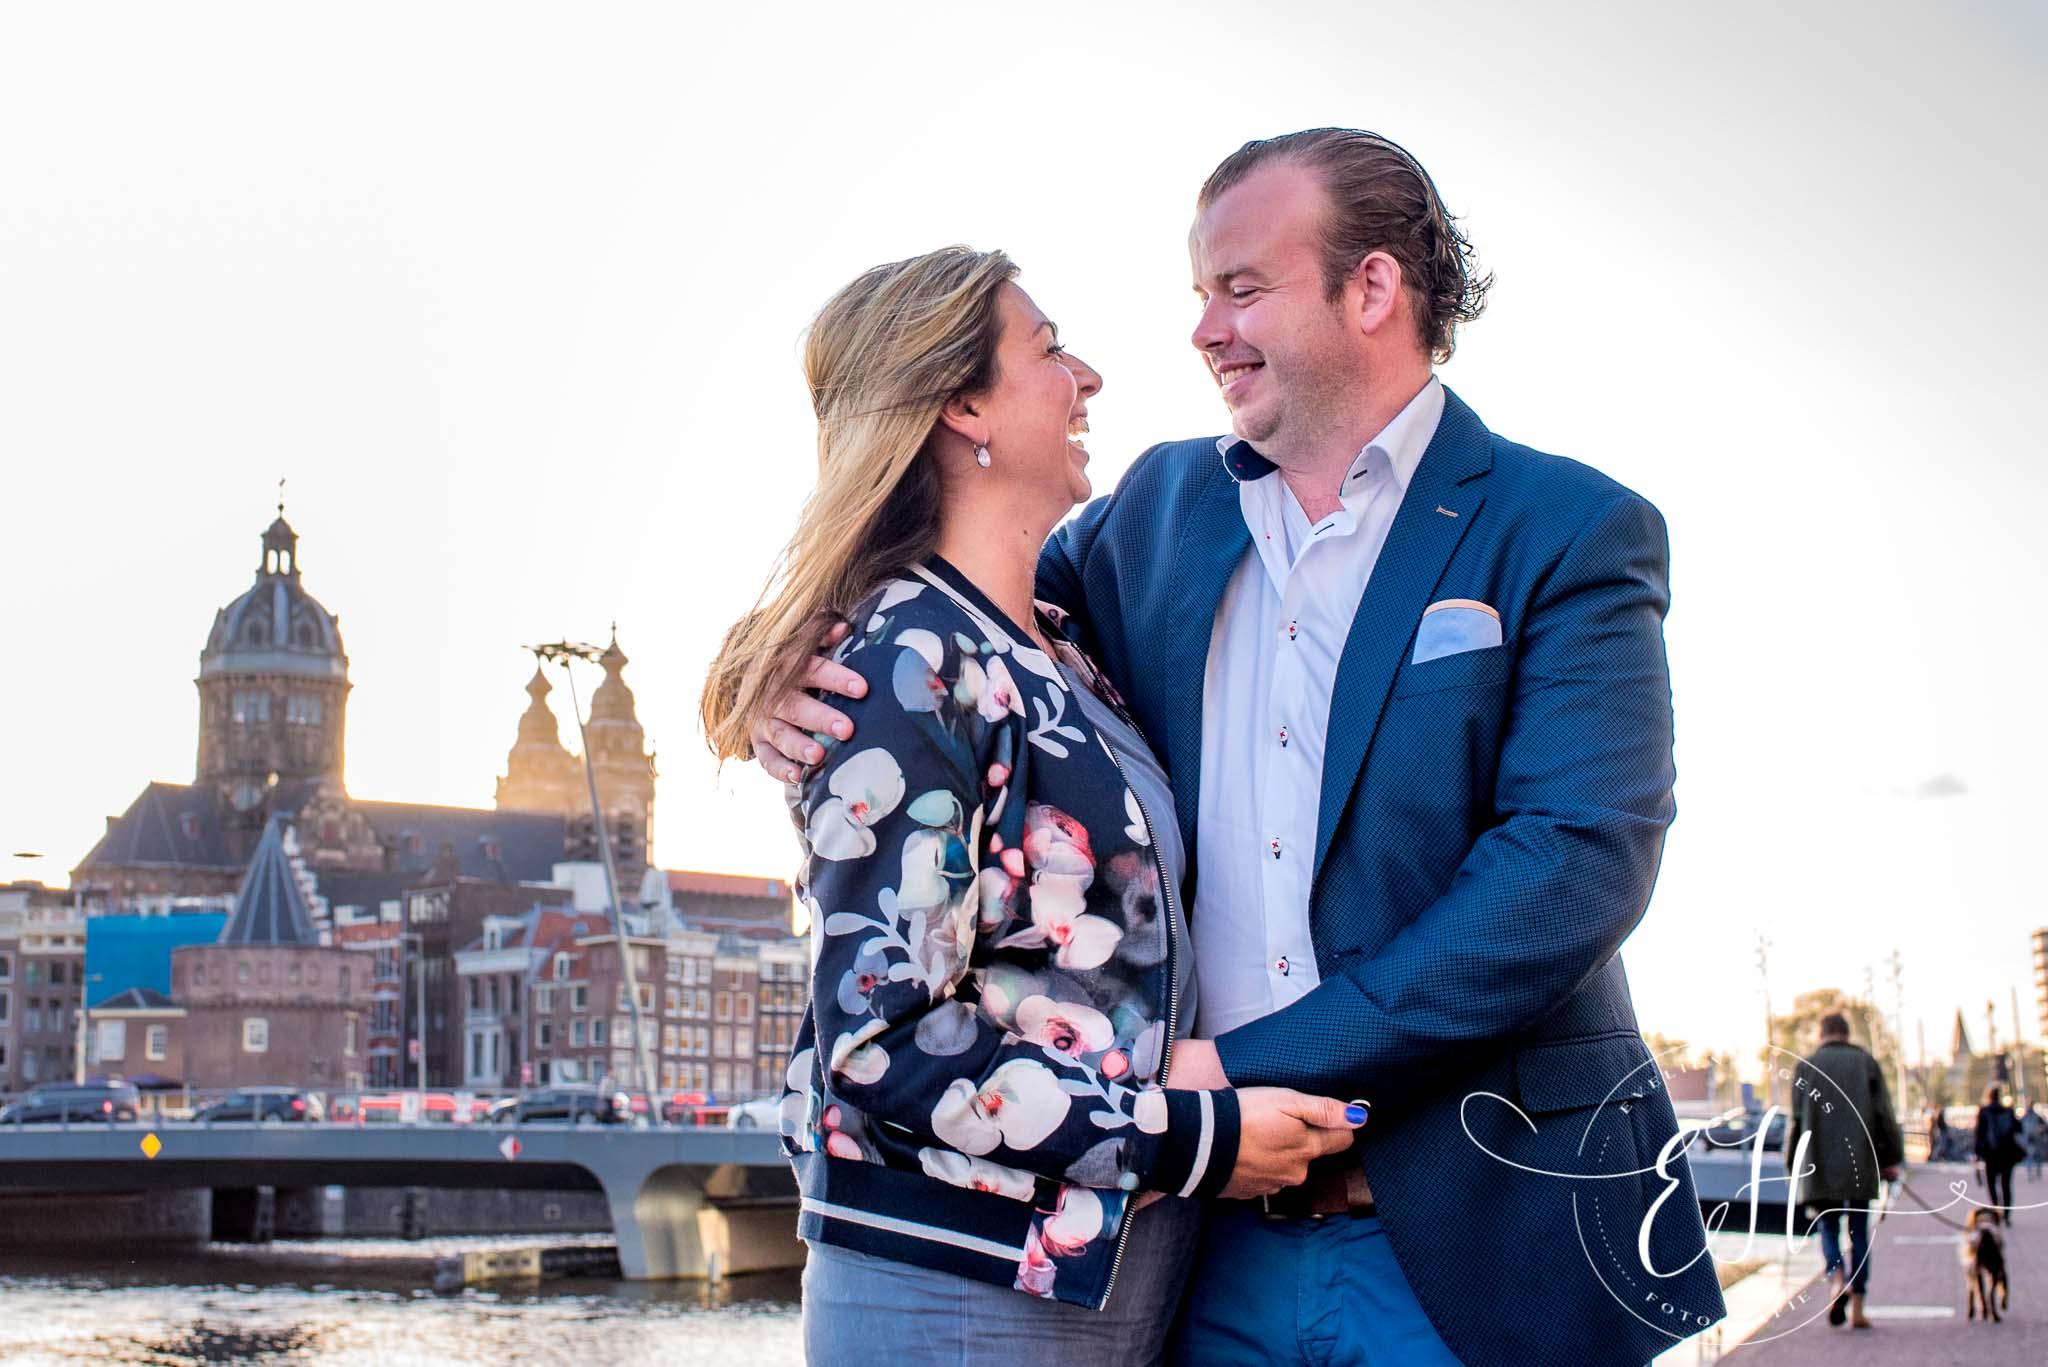 loveshoot-in-amsterdam-evelien-hogers-fotografie (3 van 26).jpg